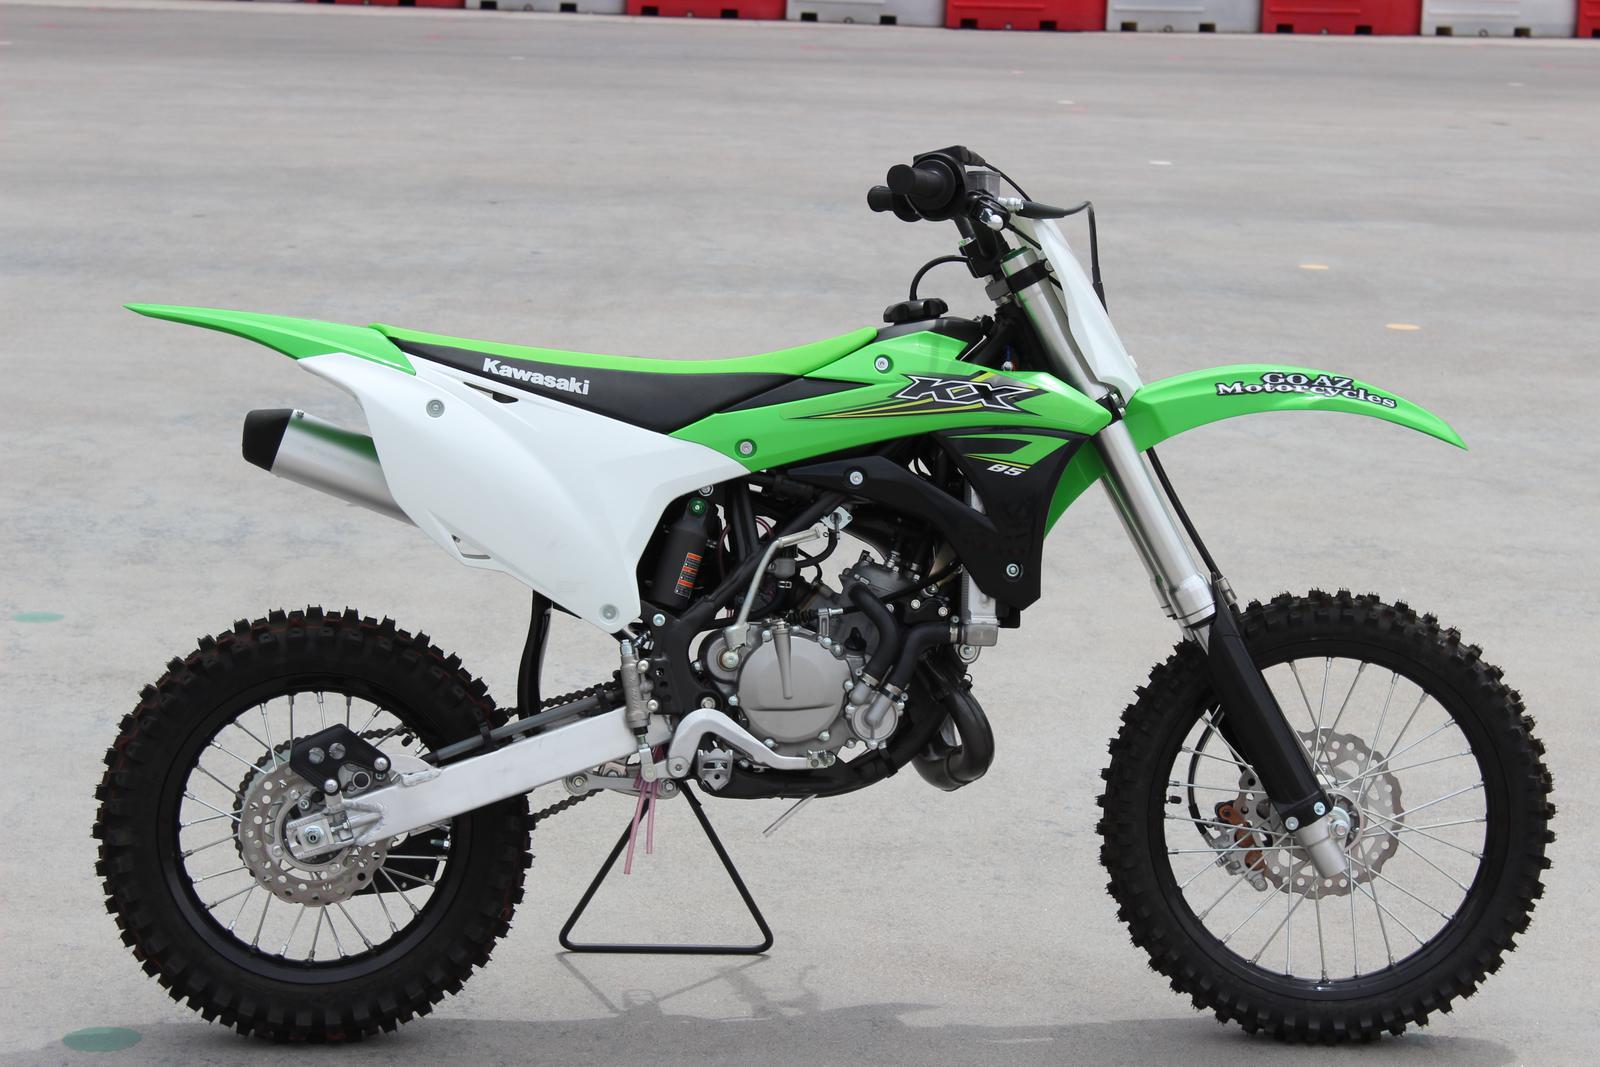 2017 kawasaki kx 85 for sale in scottsdale, az | go az motorcycles